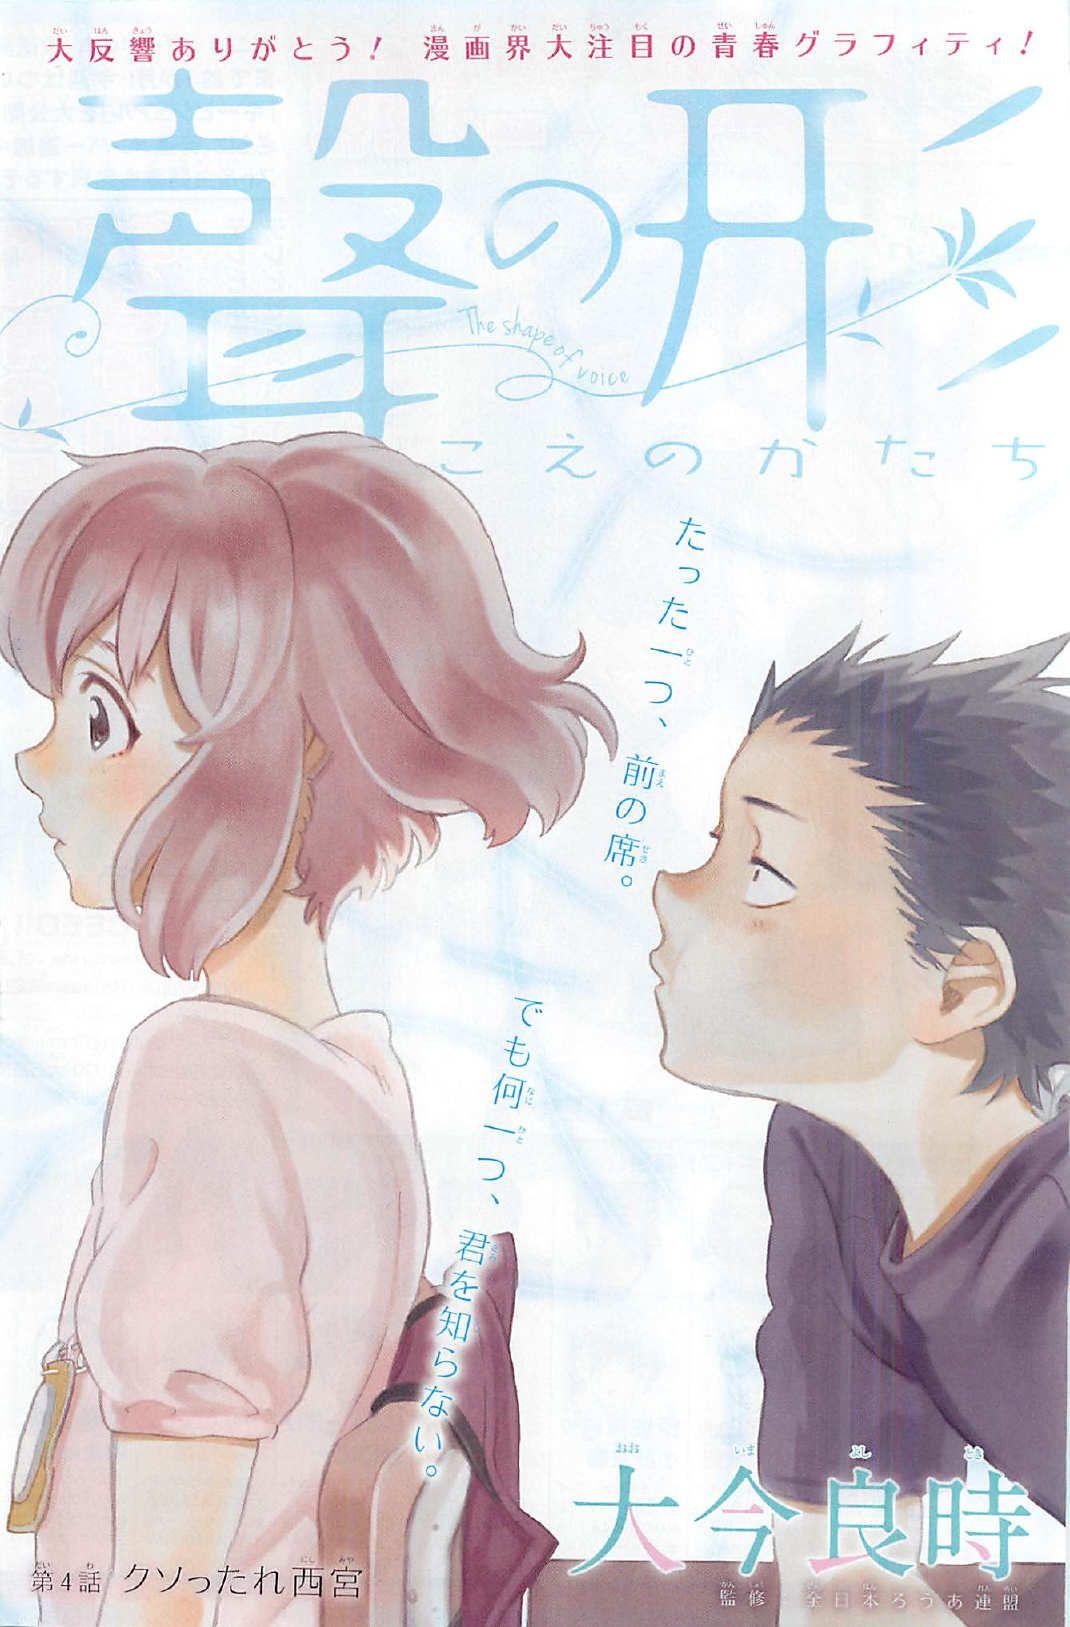 Tags Scan, Manga Cover, Official Art, Koe no Katachi